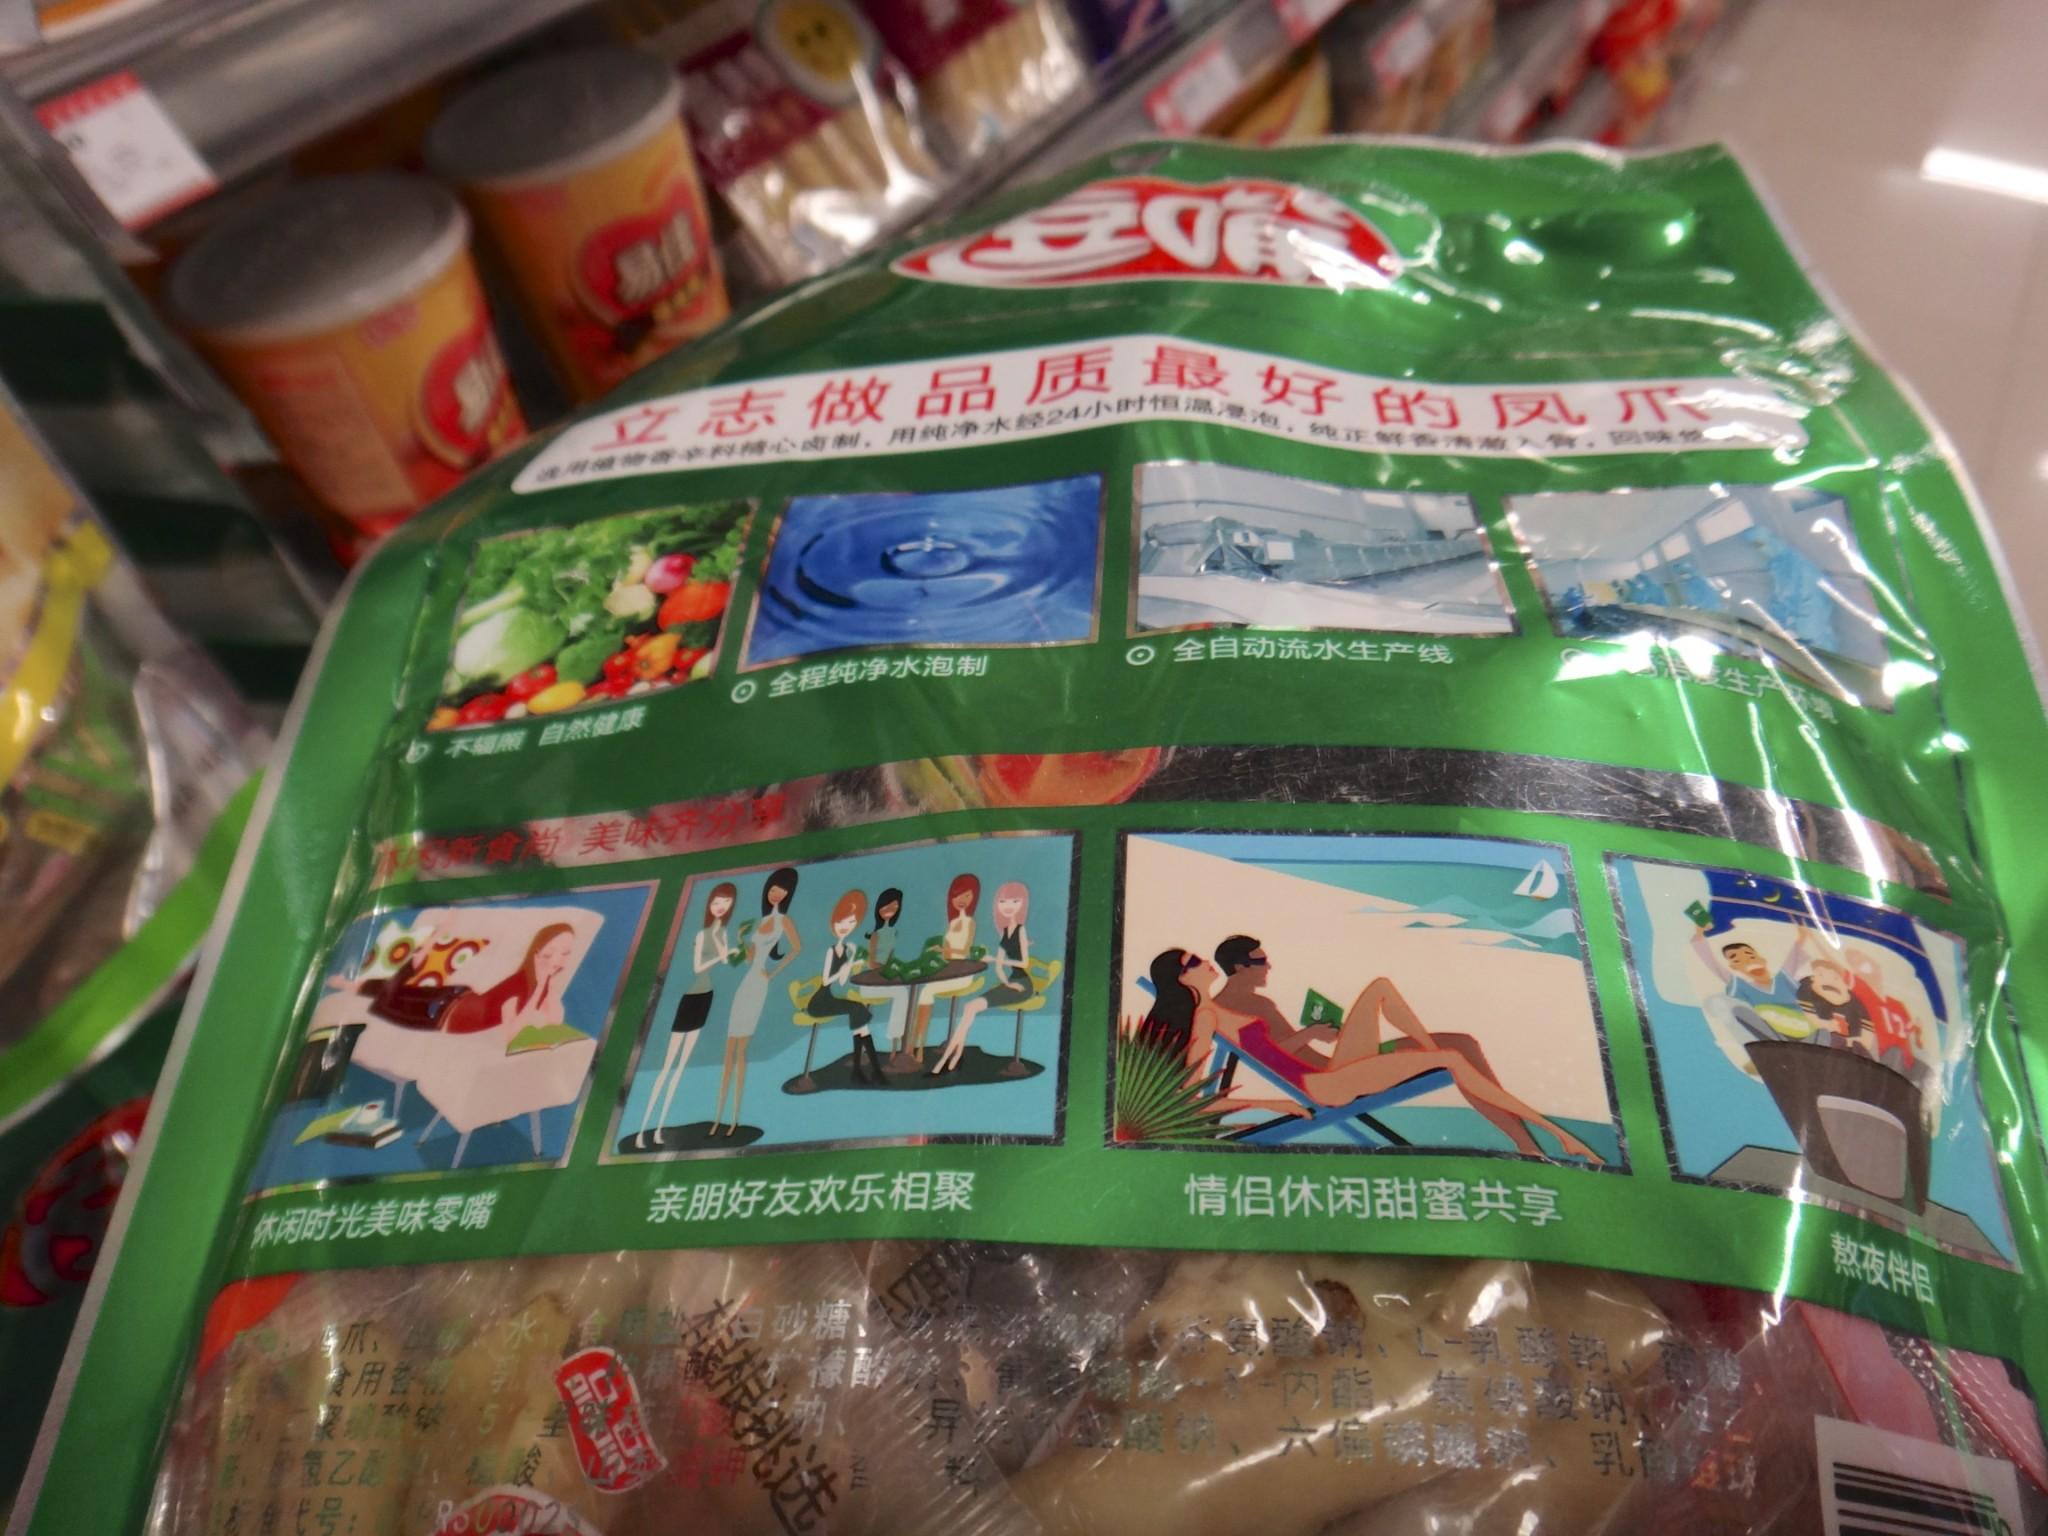 China Groceries: Chicken Feet